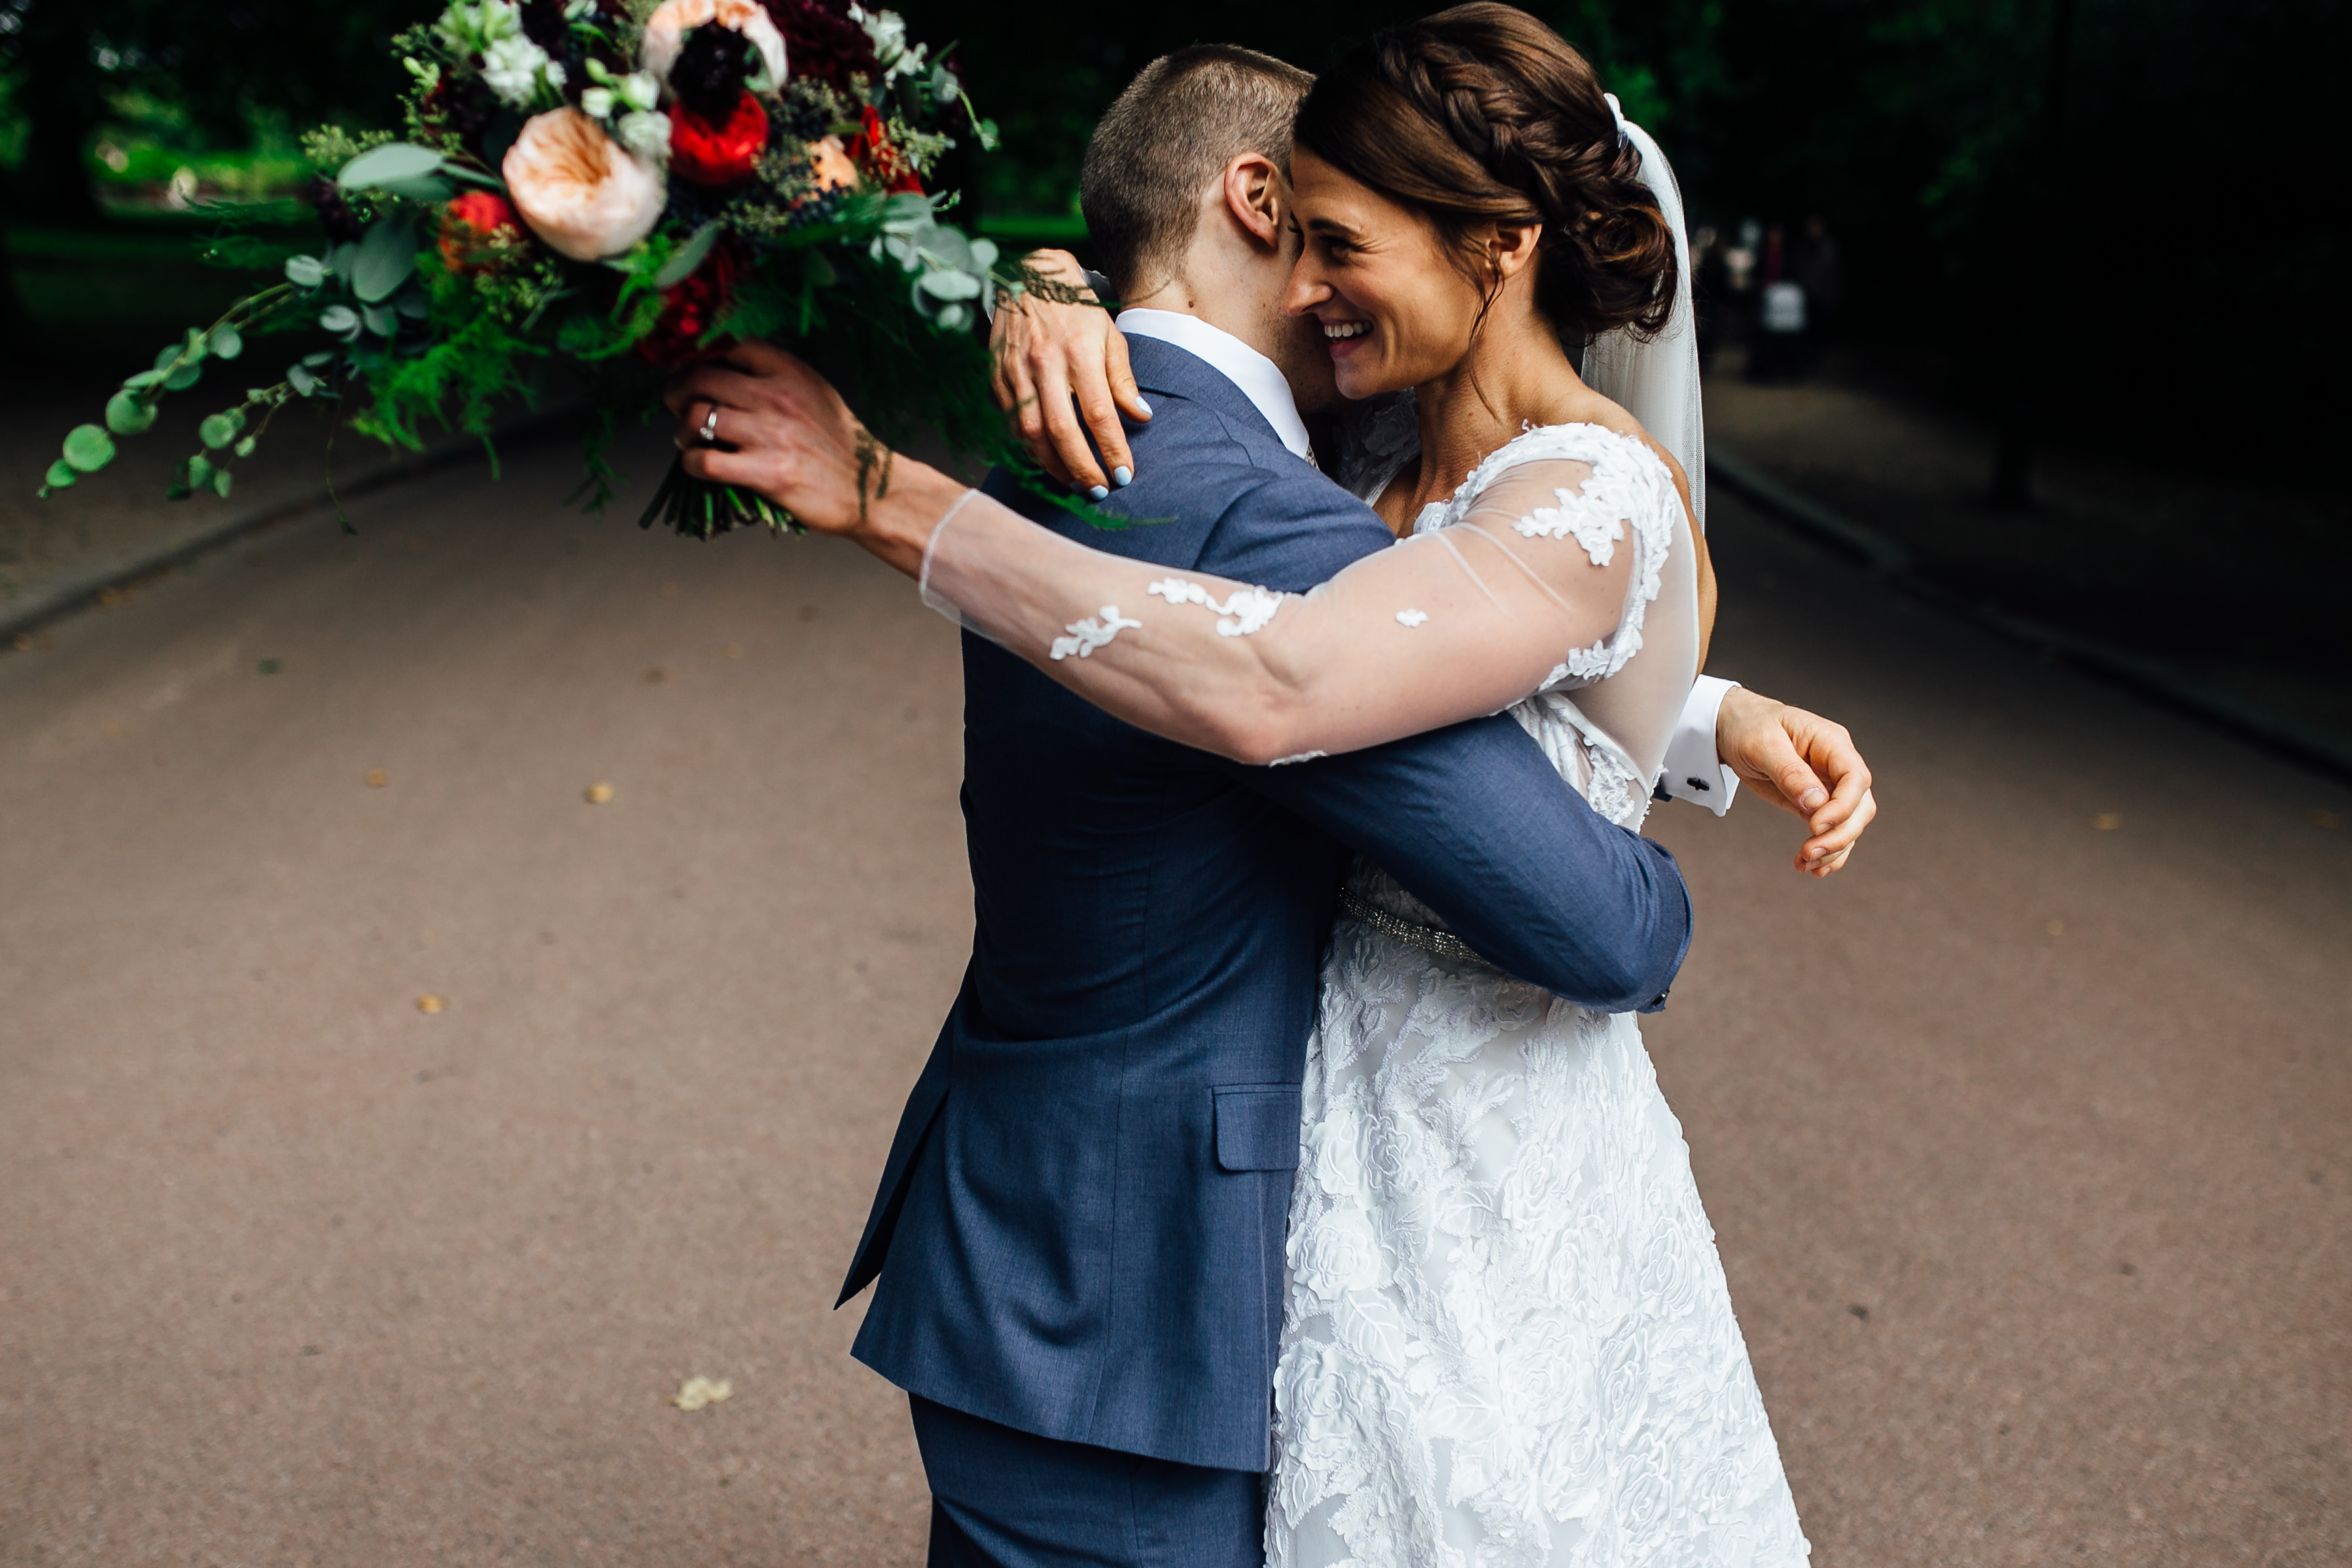 wedding photos at battersea park